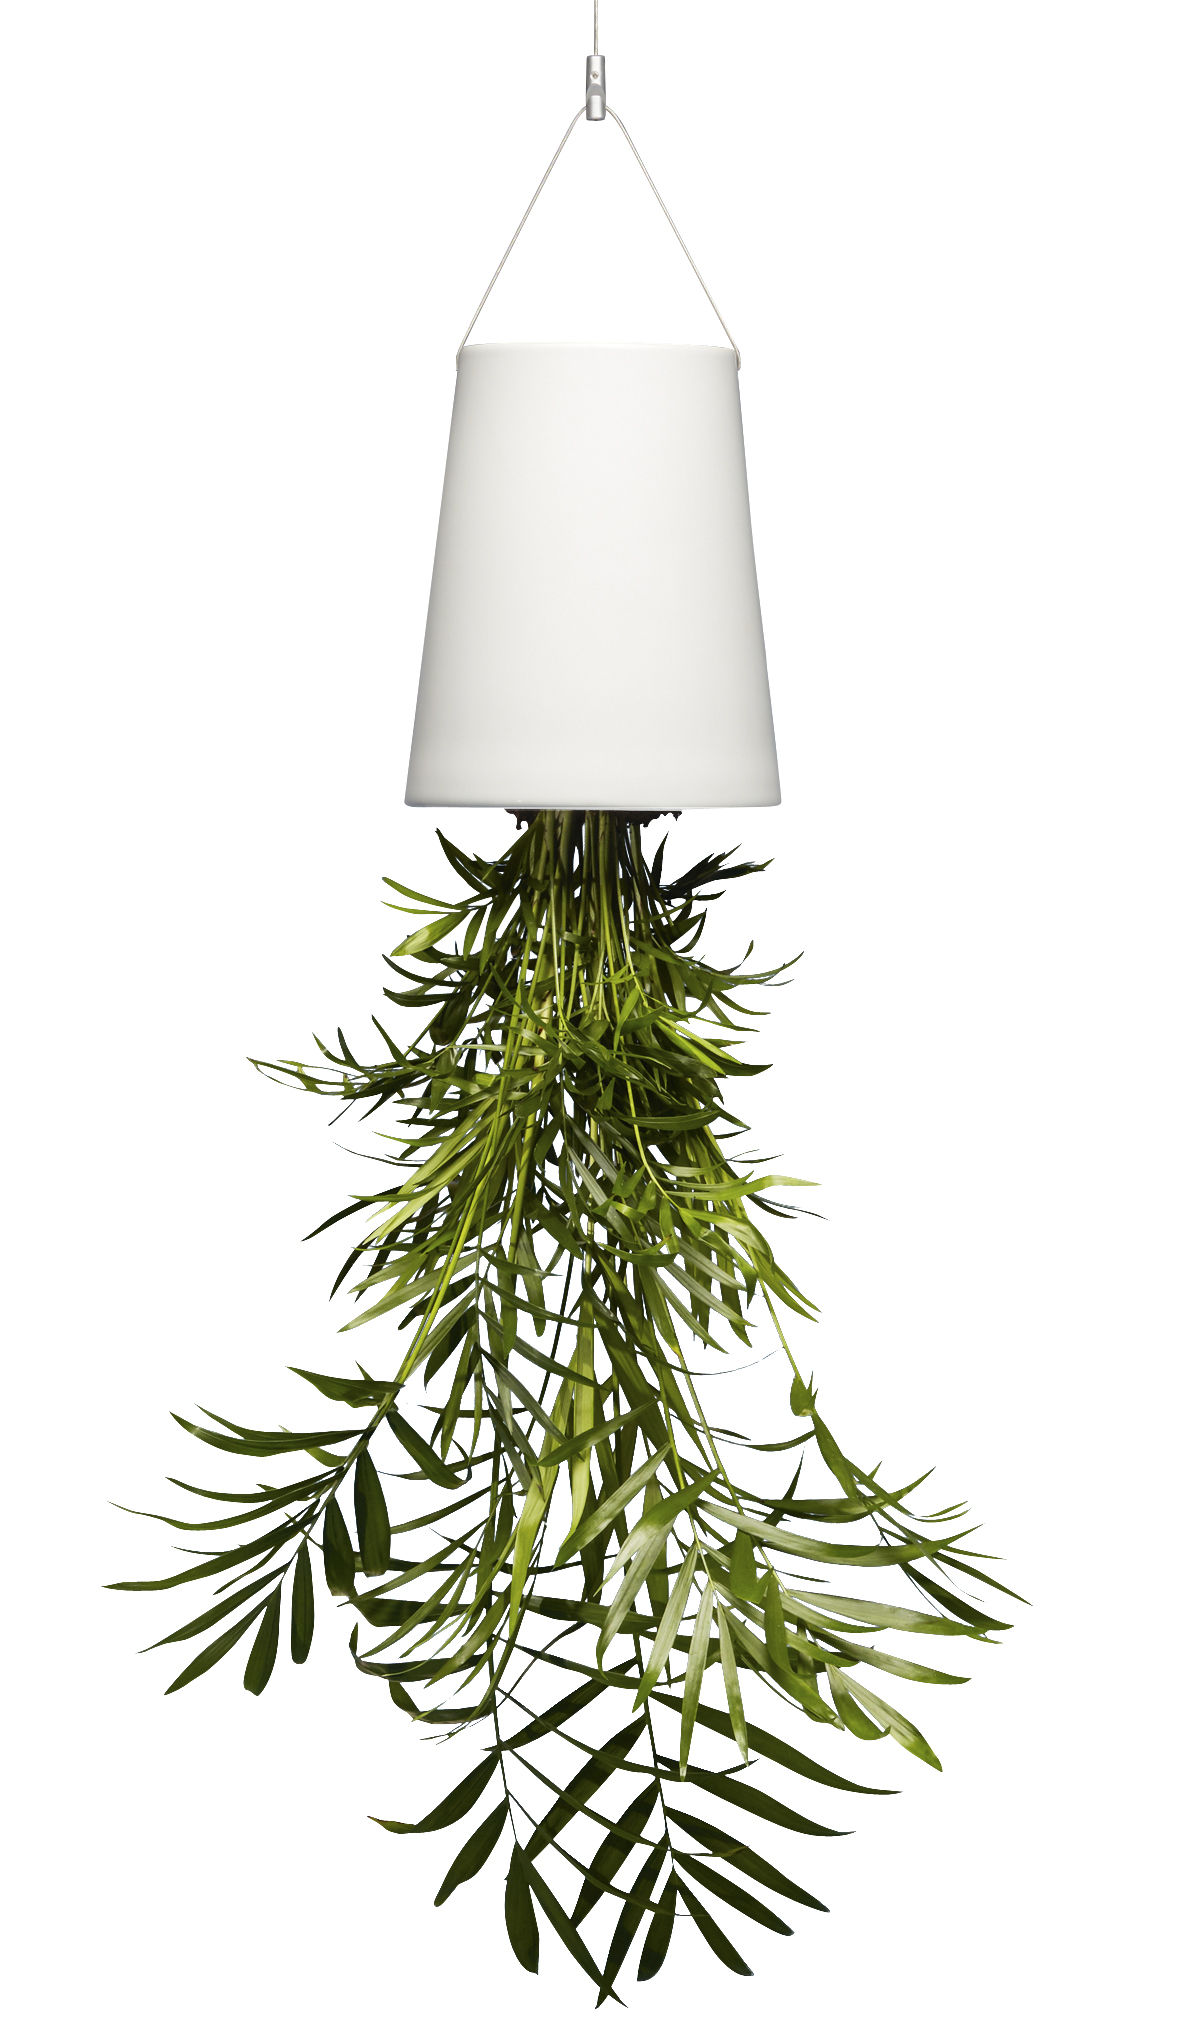 Decoration - Flower Pots & House Plants - Sky Large Hanging flowerpot - Ceramic / H 22 cm by Boskke - H 22 cm / White - Ceramic